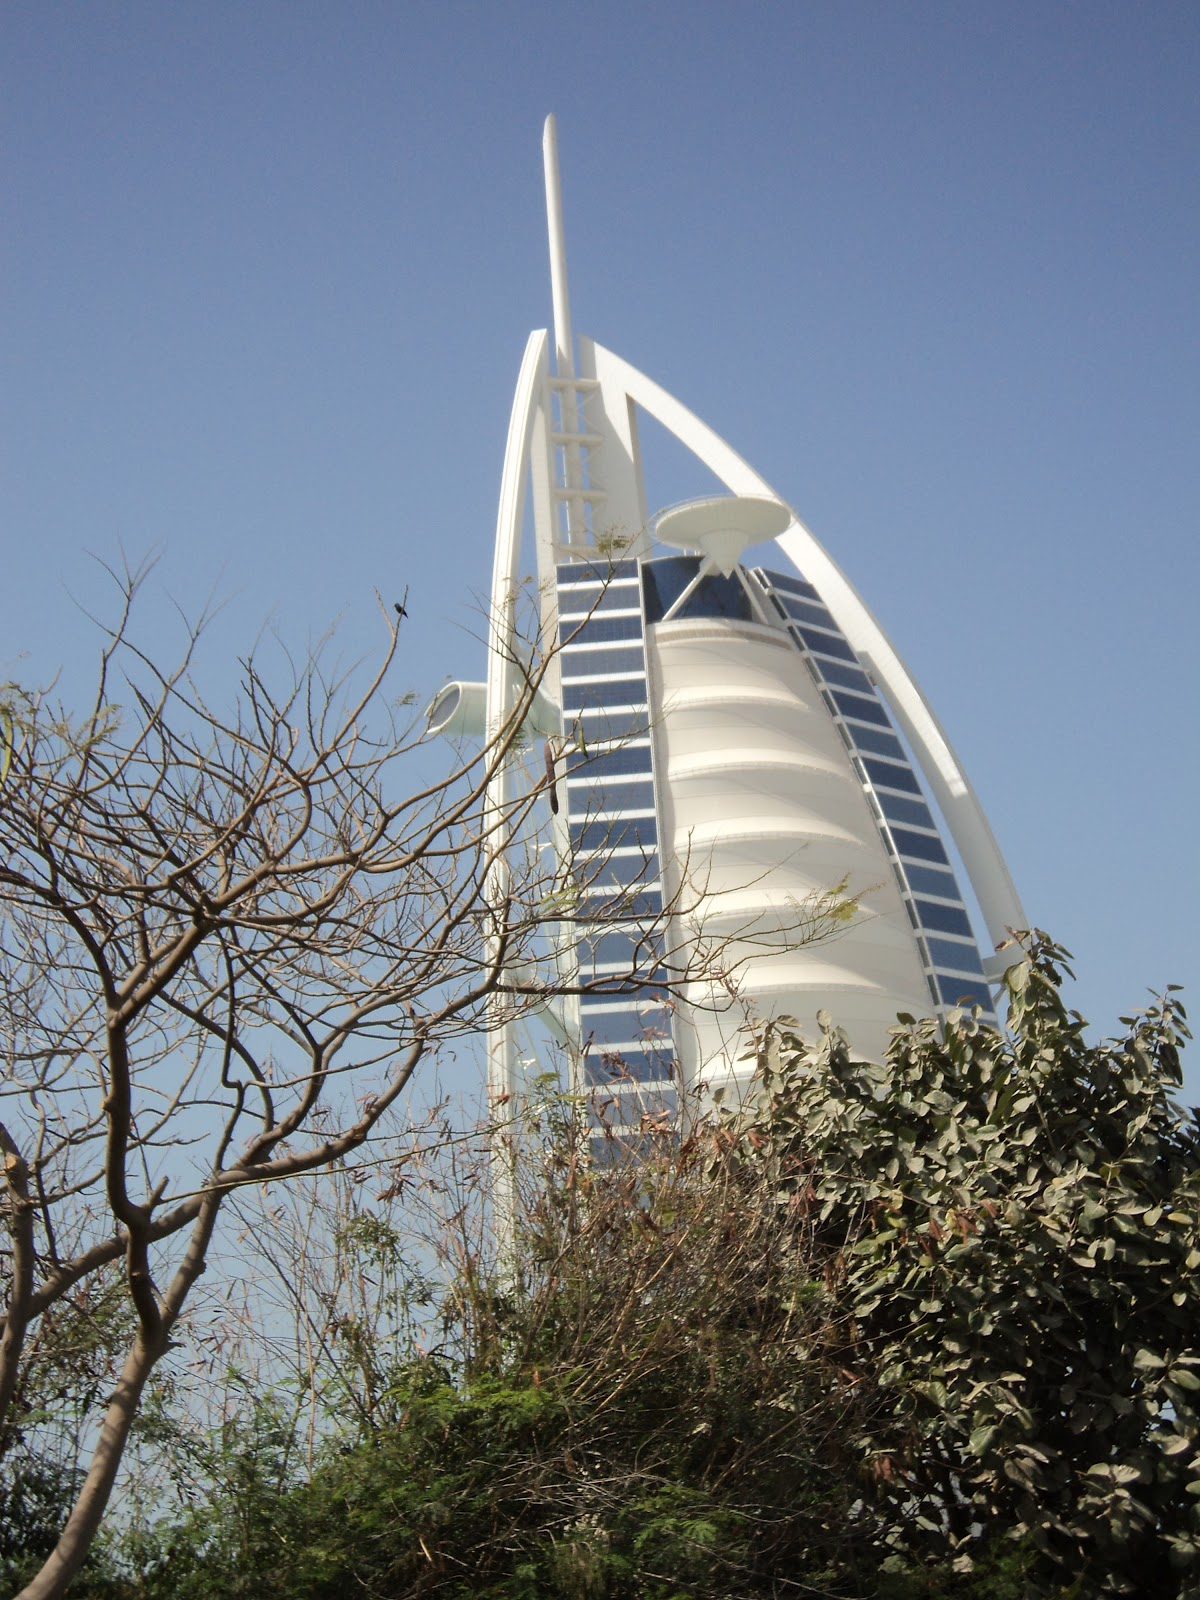 Oriental adventures burj al arab for Burj al arab per night